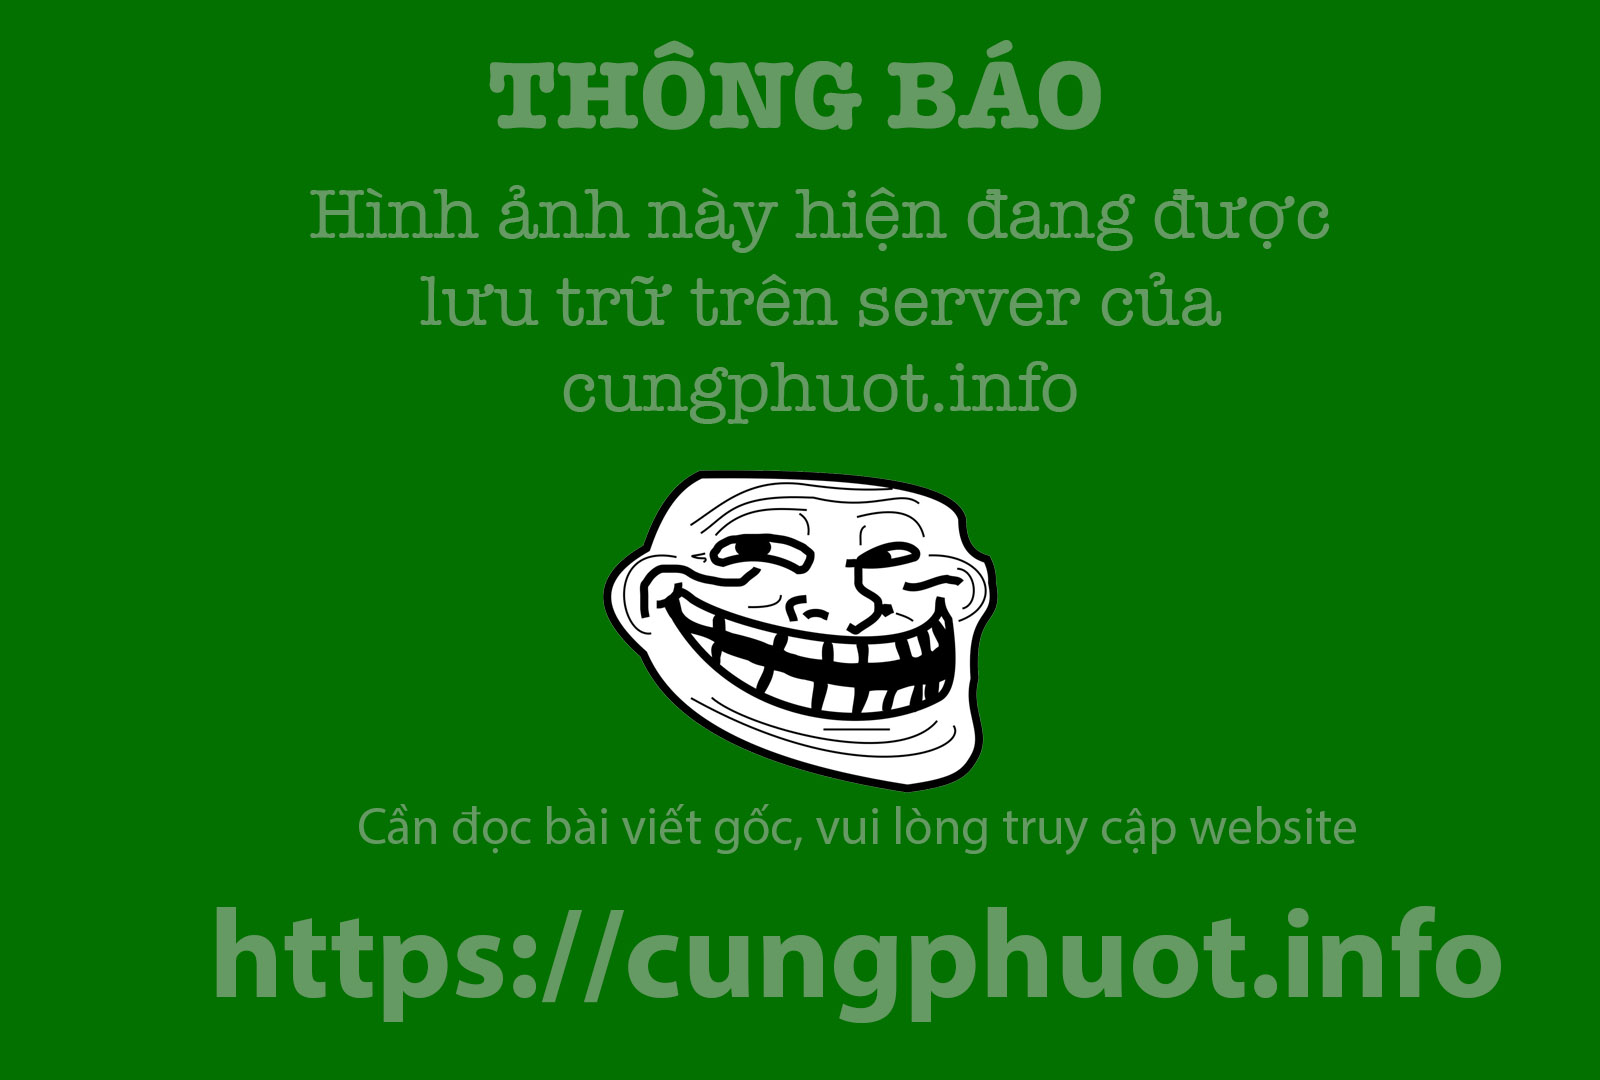 Dan phuot me man ve dep ky vi cua hang Prai o Quang Tri hinh anh 4